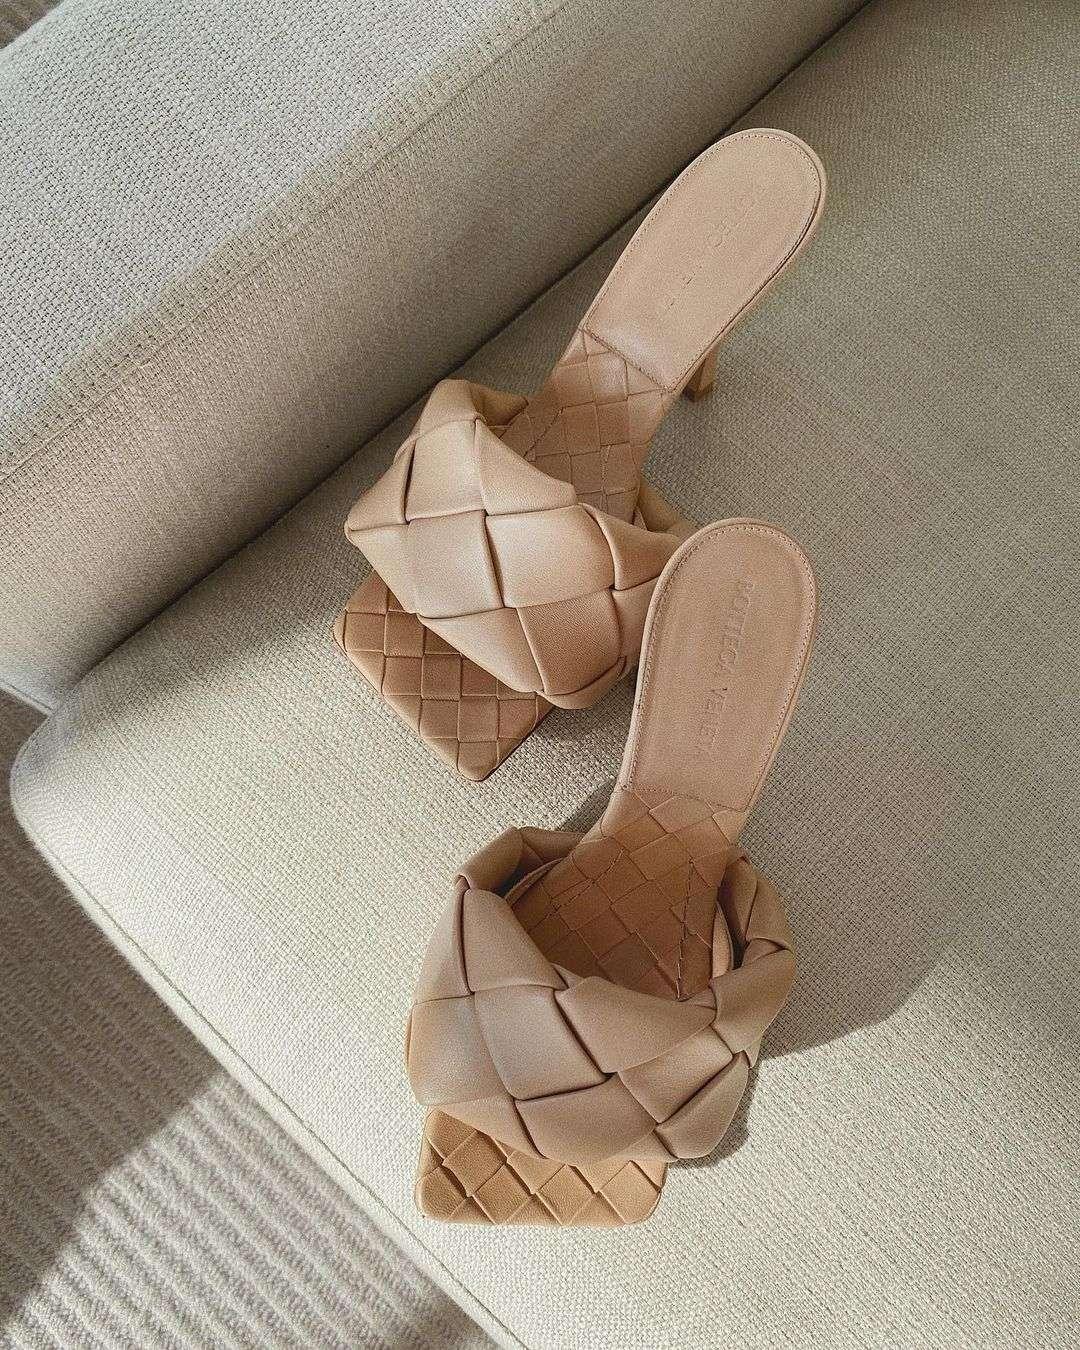 Bottega Veneta Lido Sandals